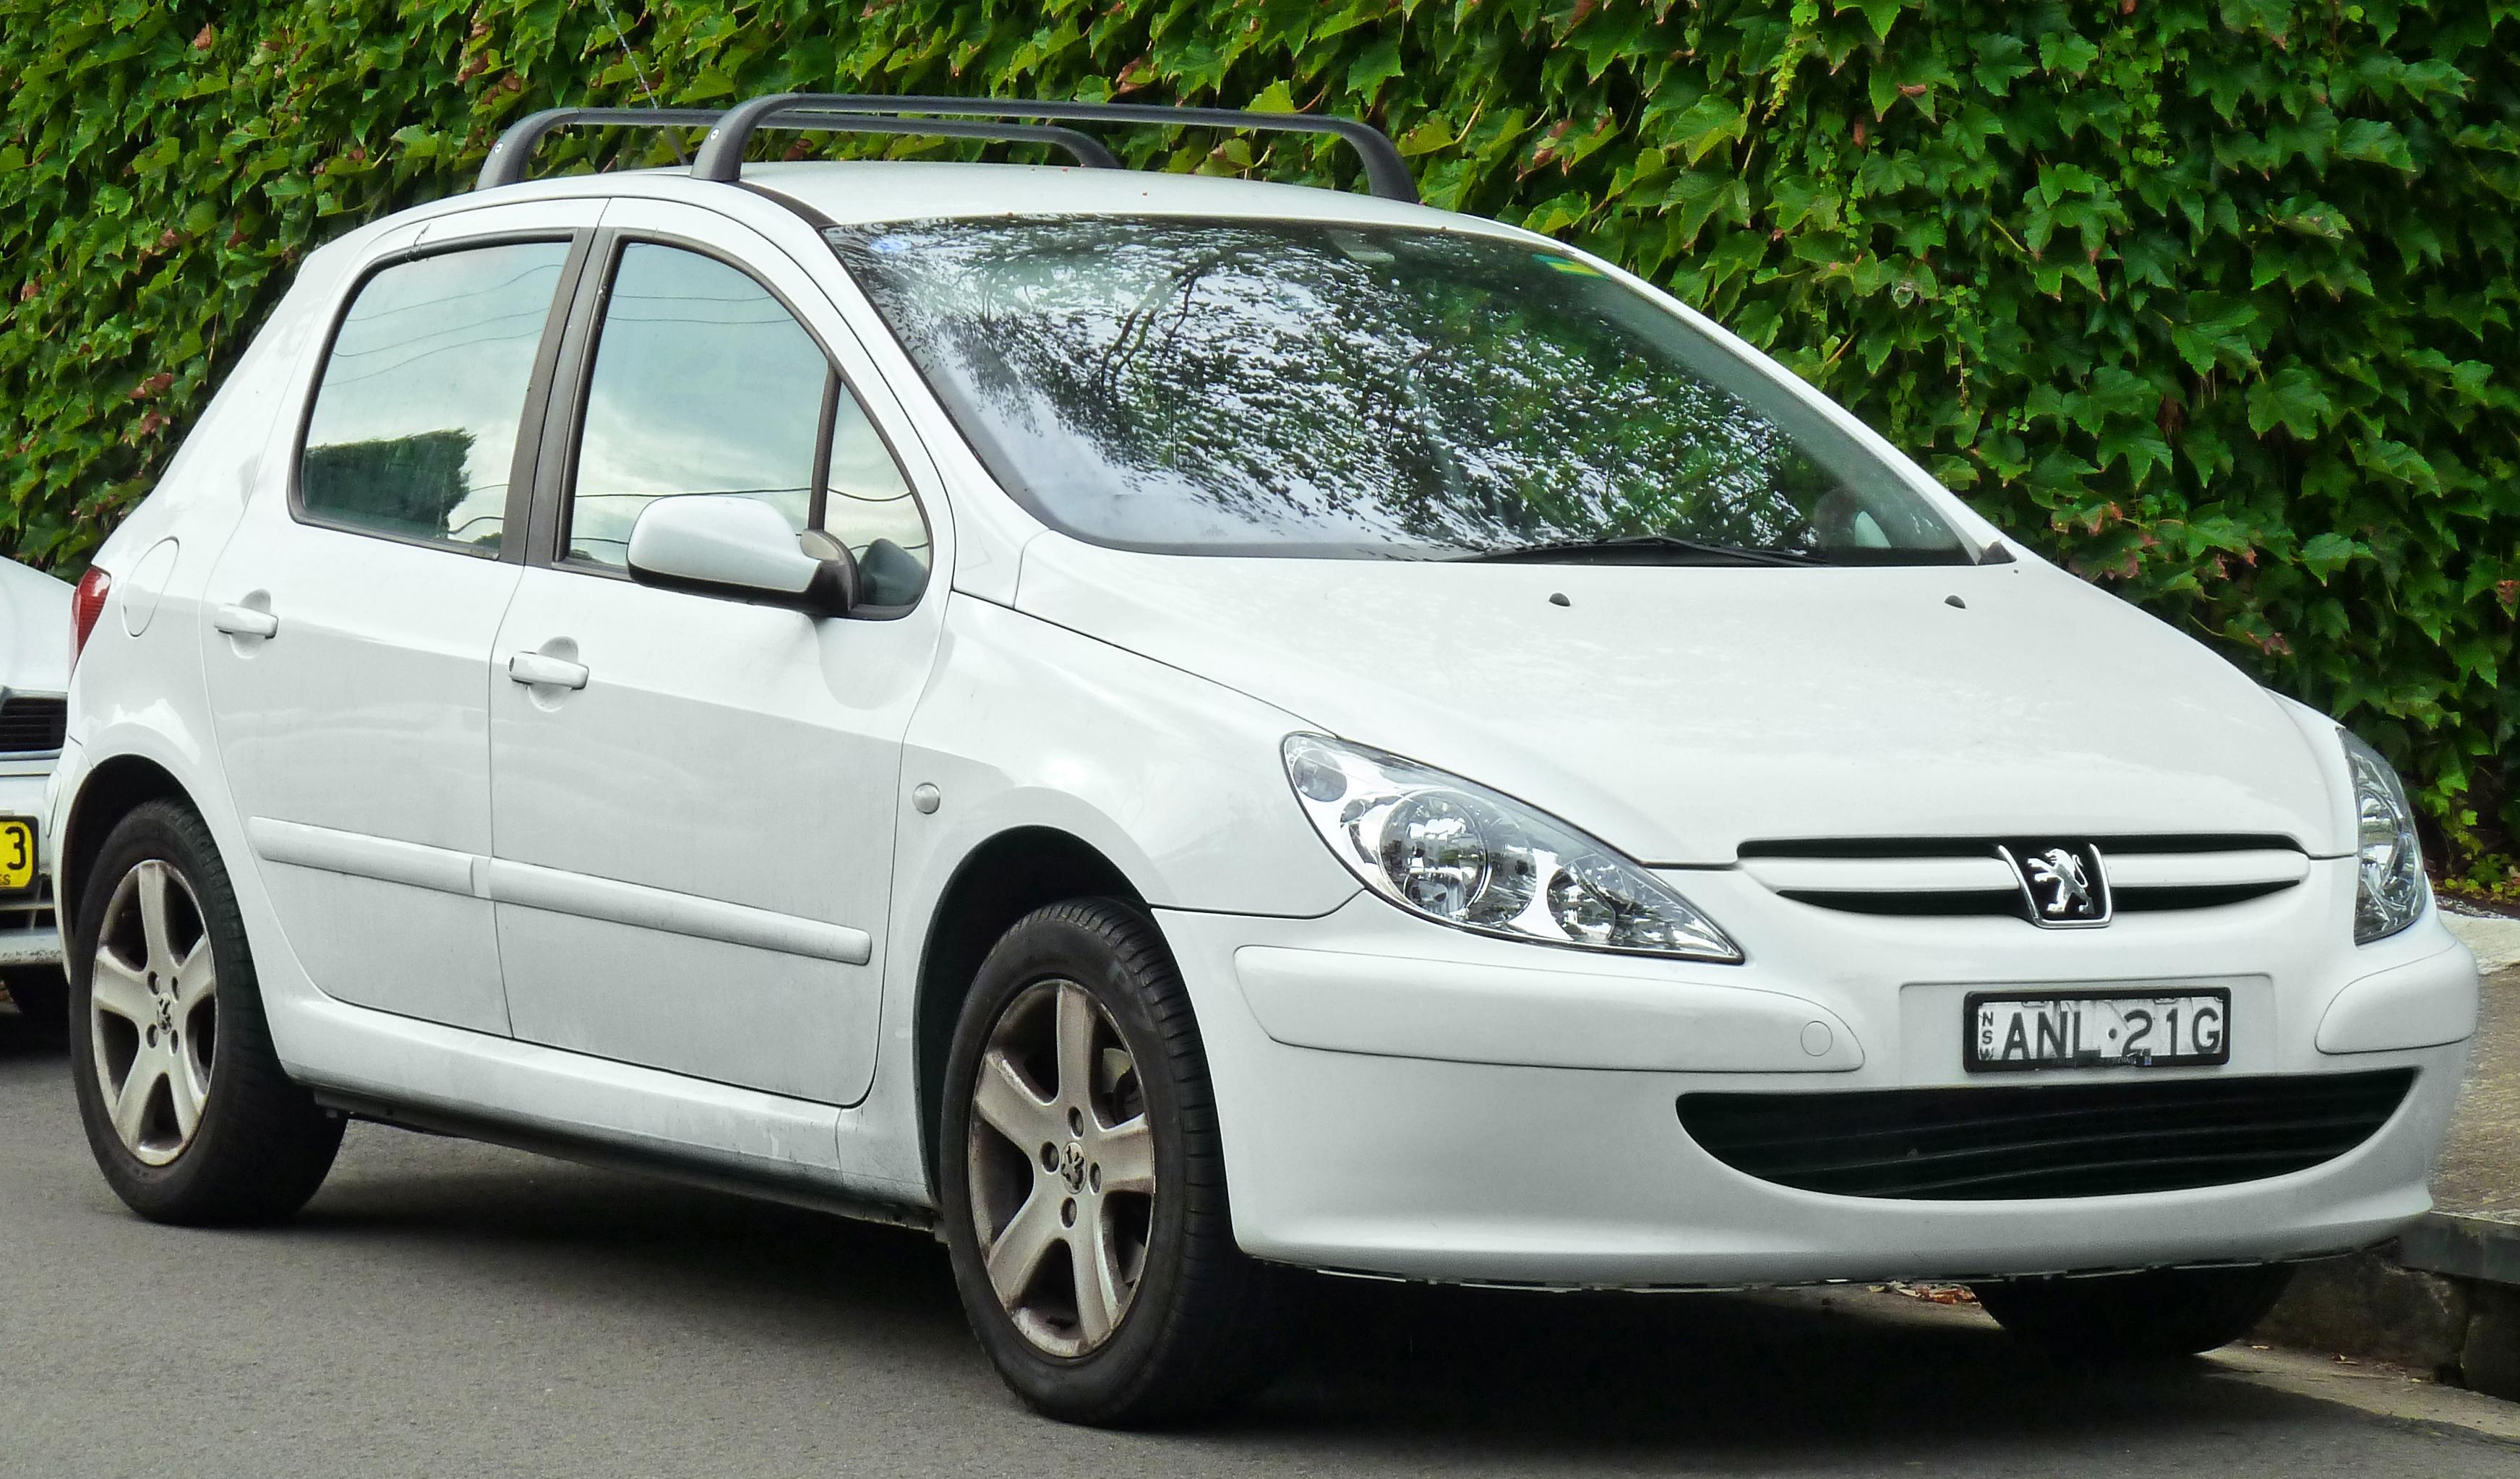 File:2001-2005 Peugeot 307 (T5) 5-door hatchback (2011